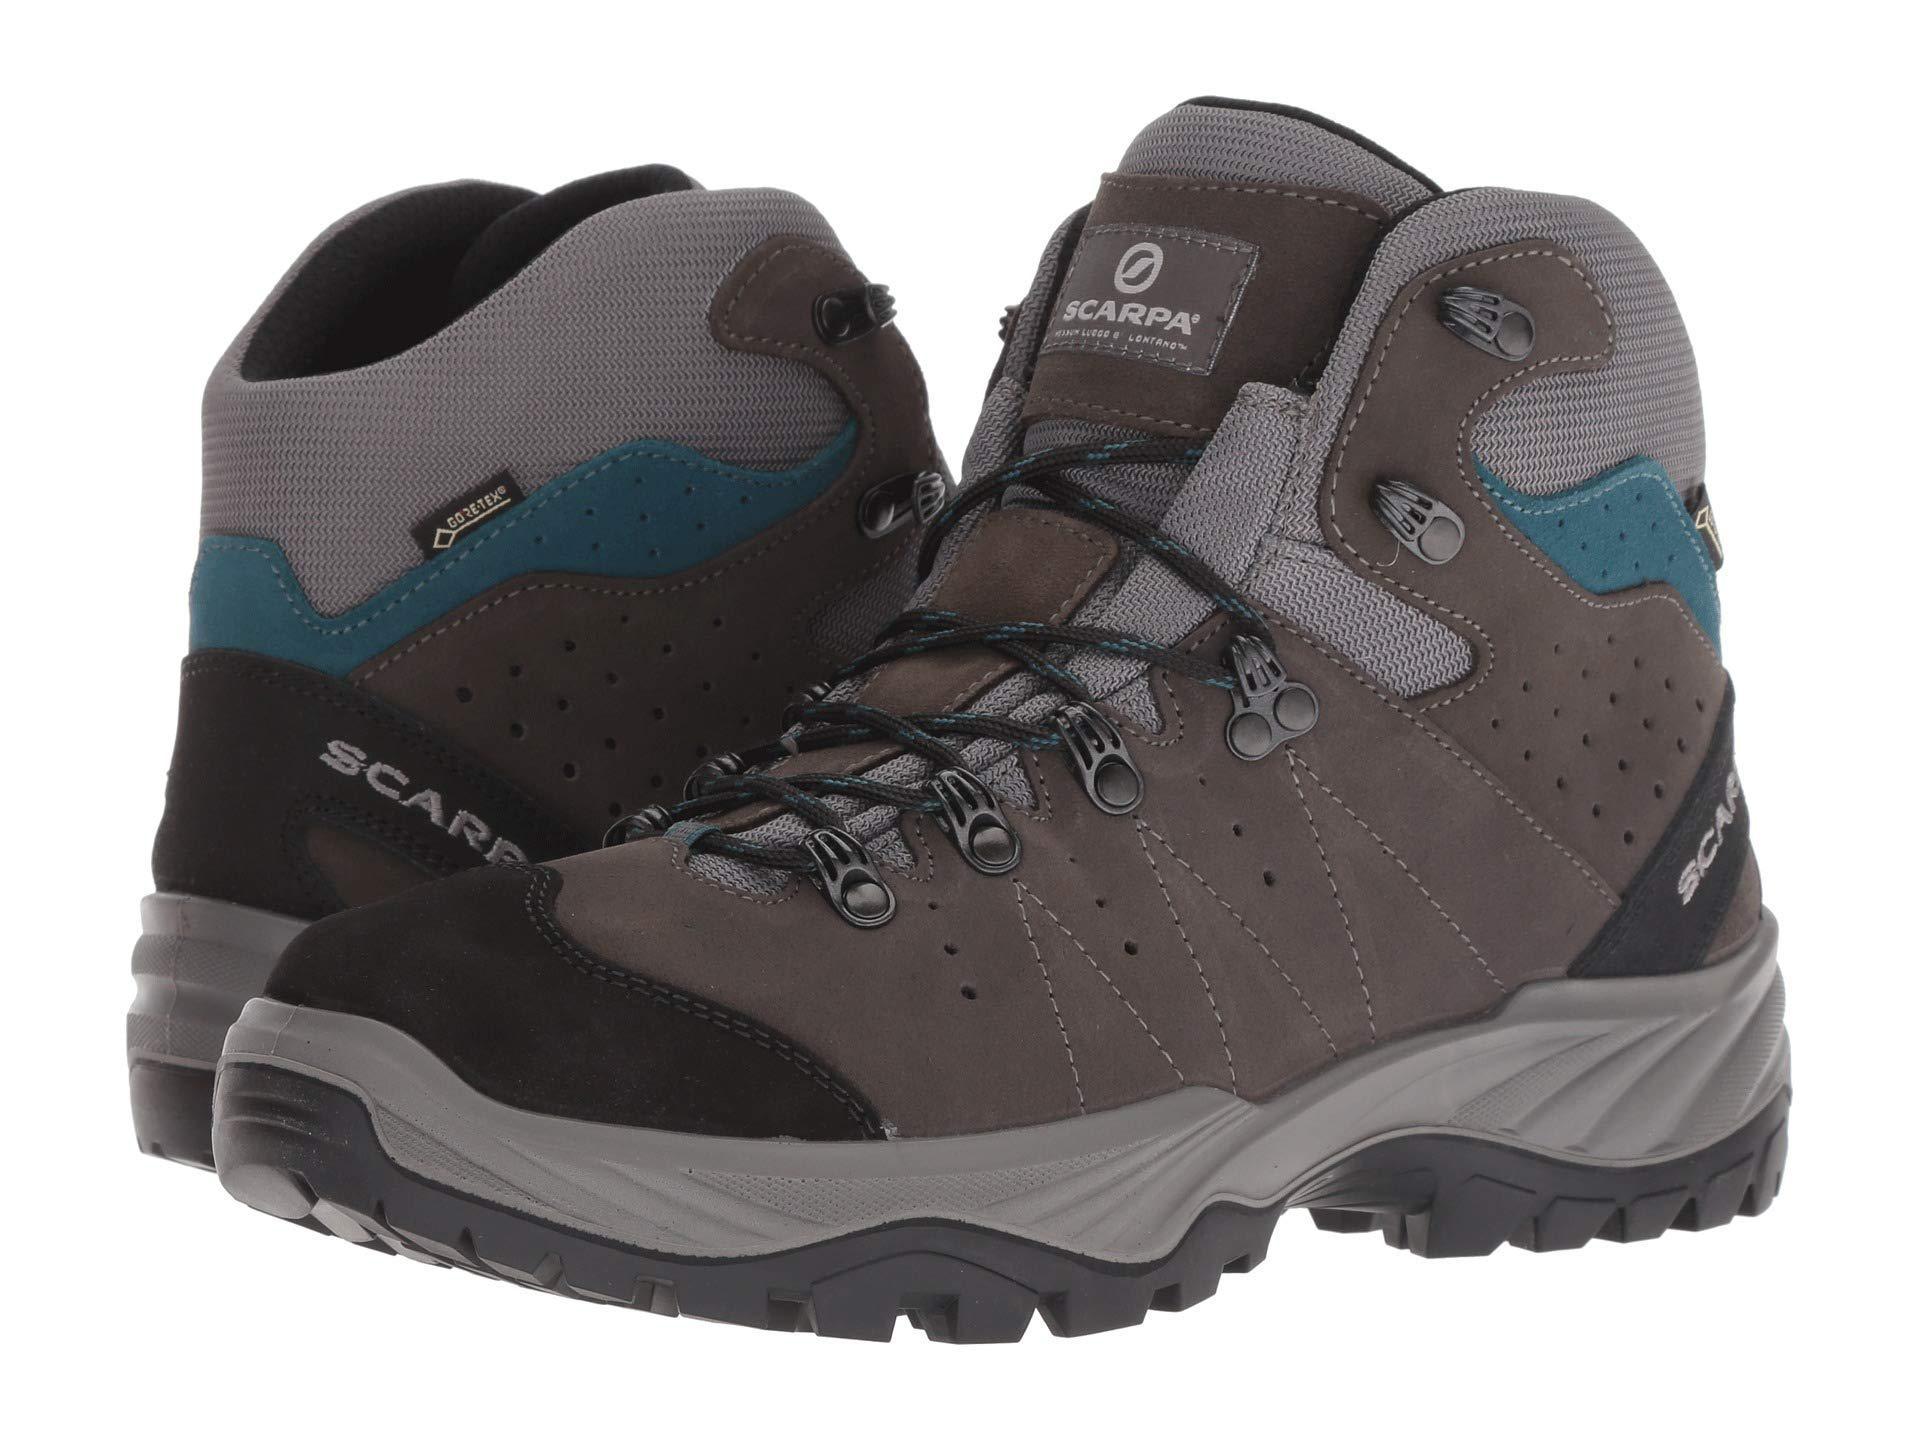 afc5c7f695b8 scarpa-SmokeLake-Mistral-Gtxr-smokelake-Mens-Hiking-Boots.jpeg